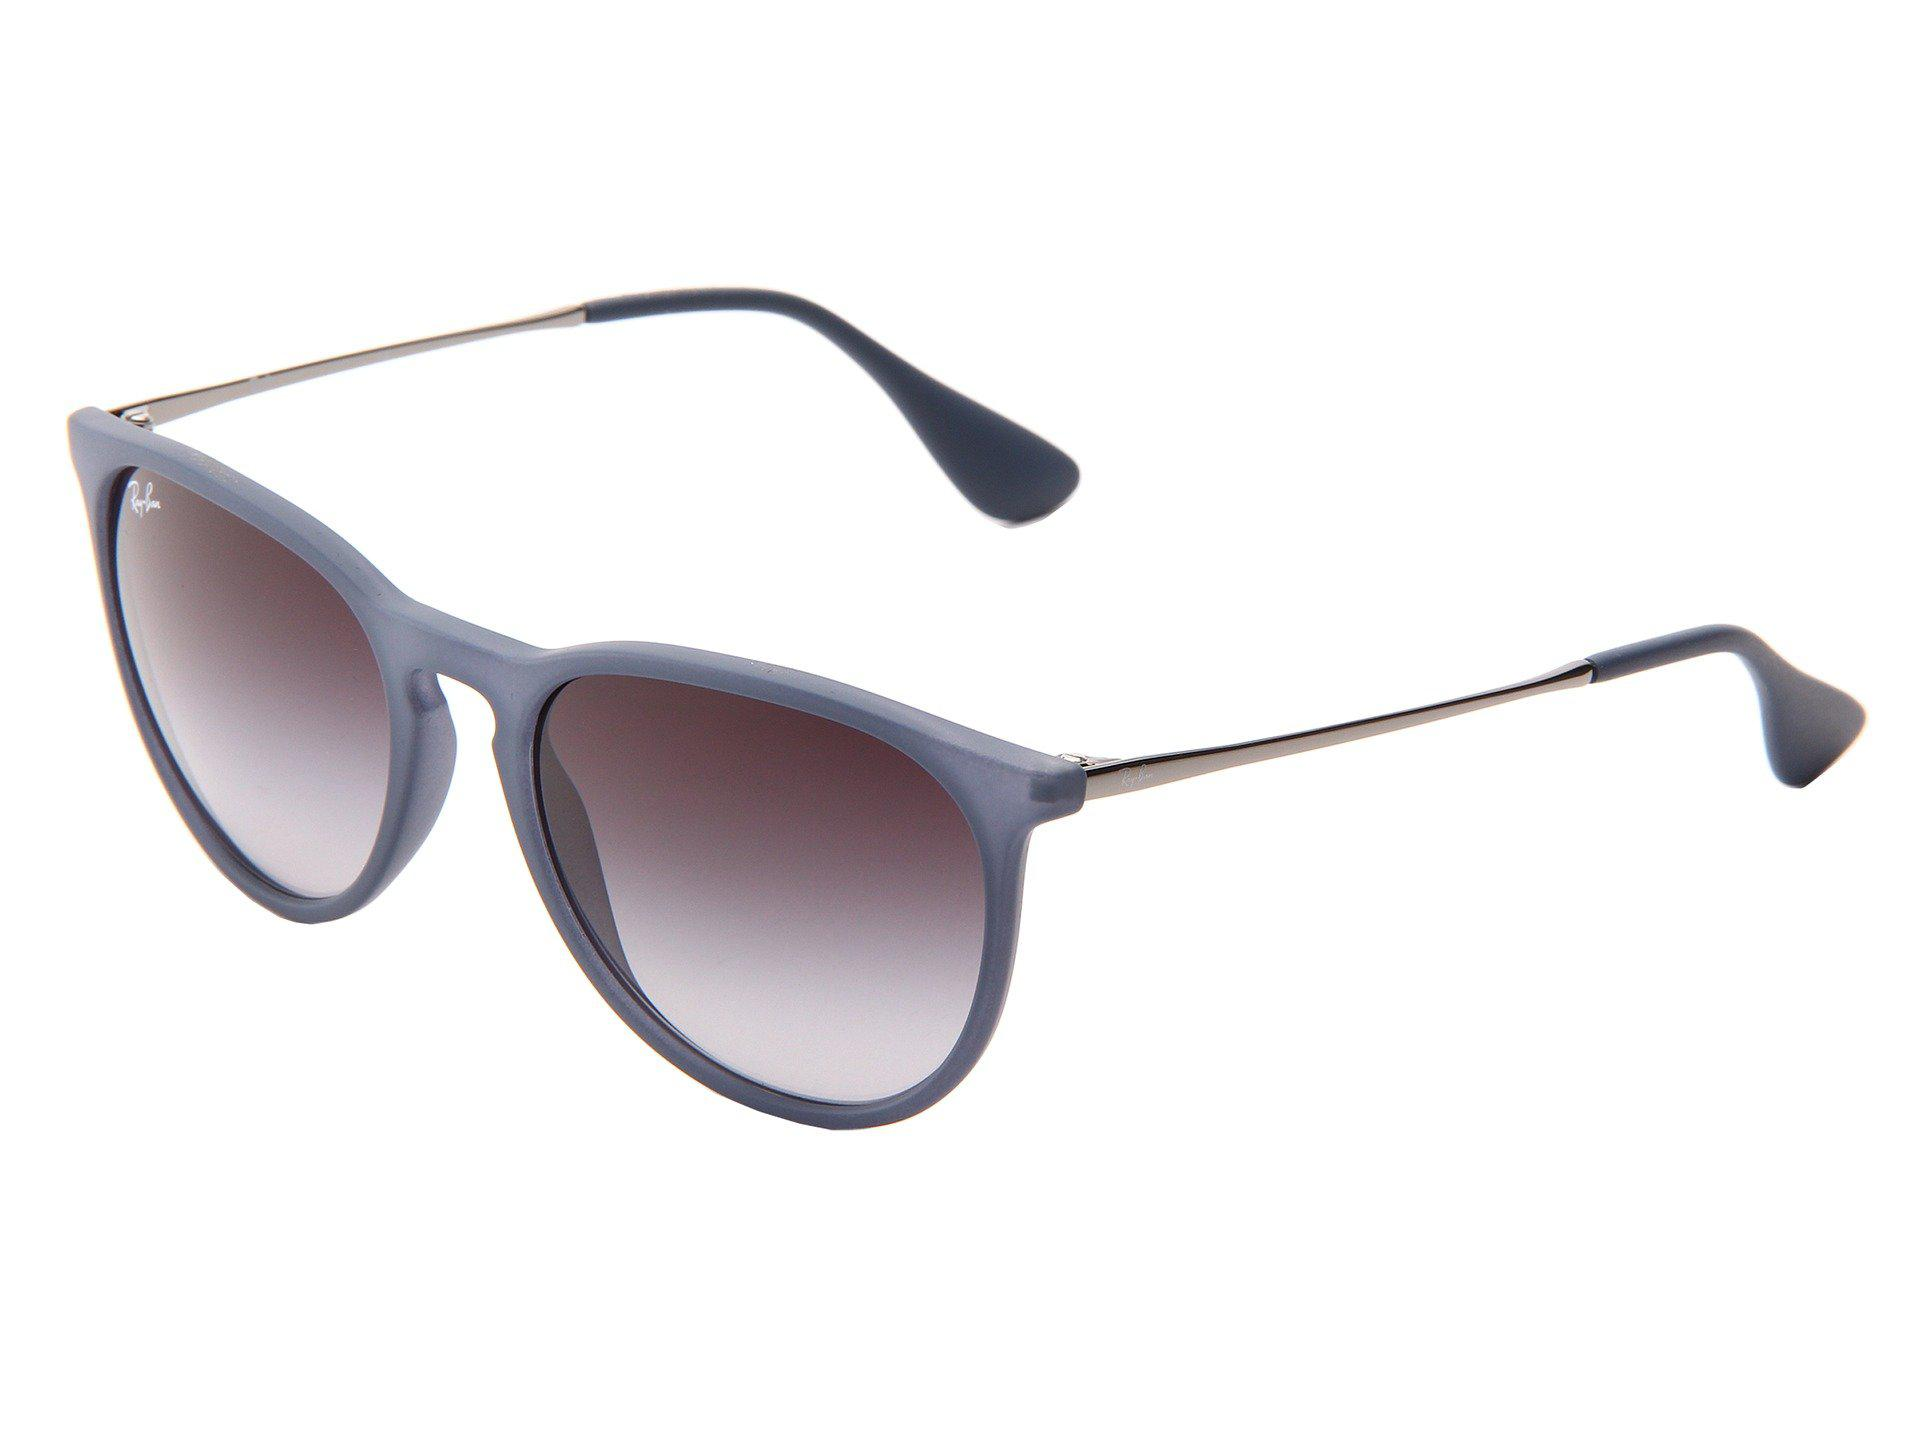 06606142db193 ... sale ray ban. womens blue erika rubberized havana plastic frame fashion  sunglasses cf34b b1f57